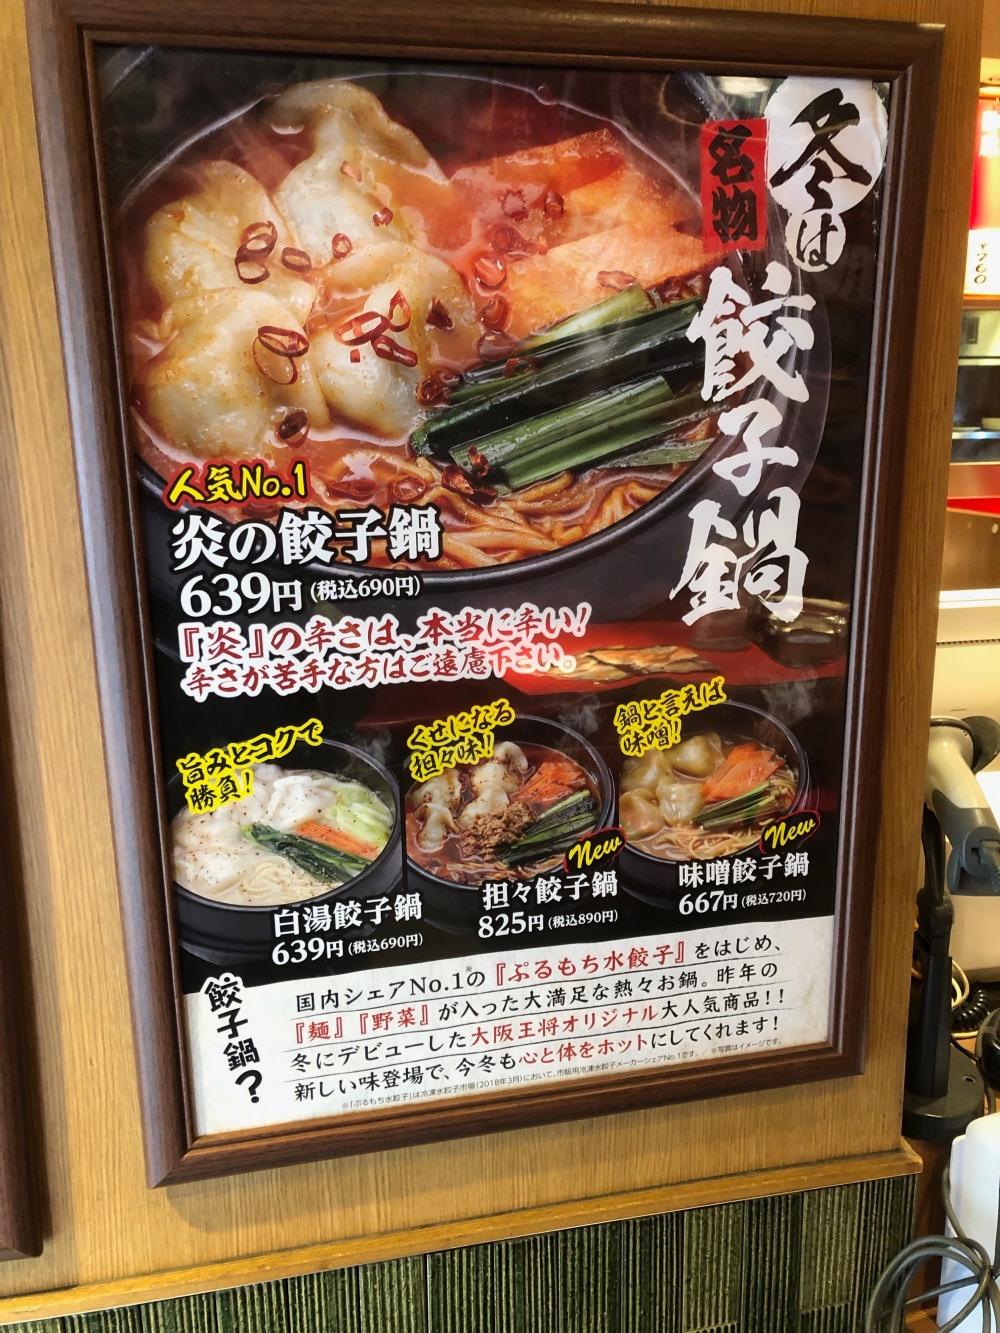 王将 の 王将 大阪 餃子